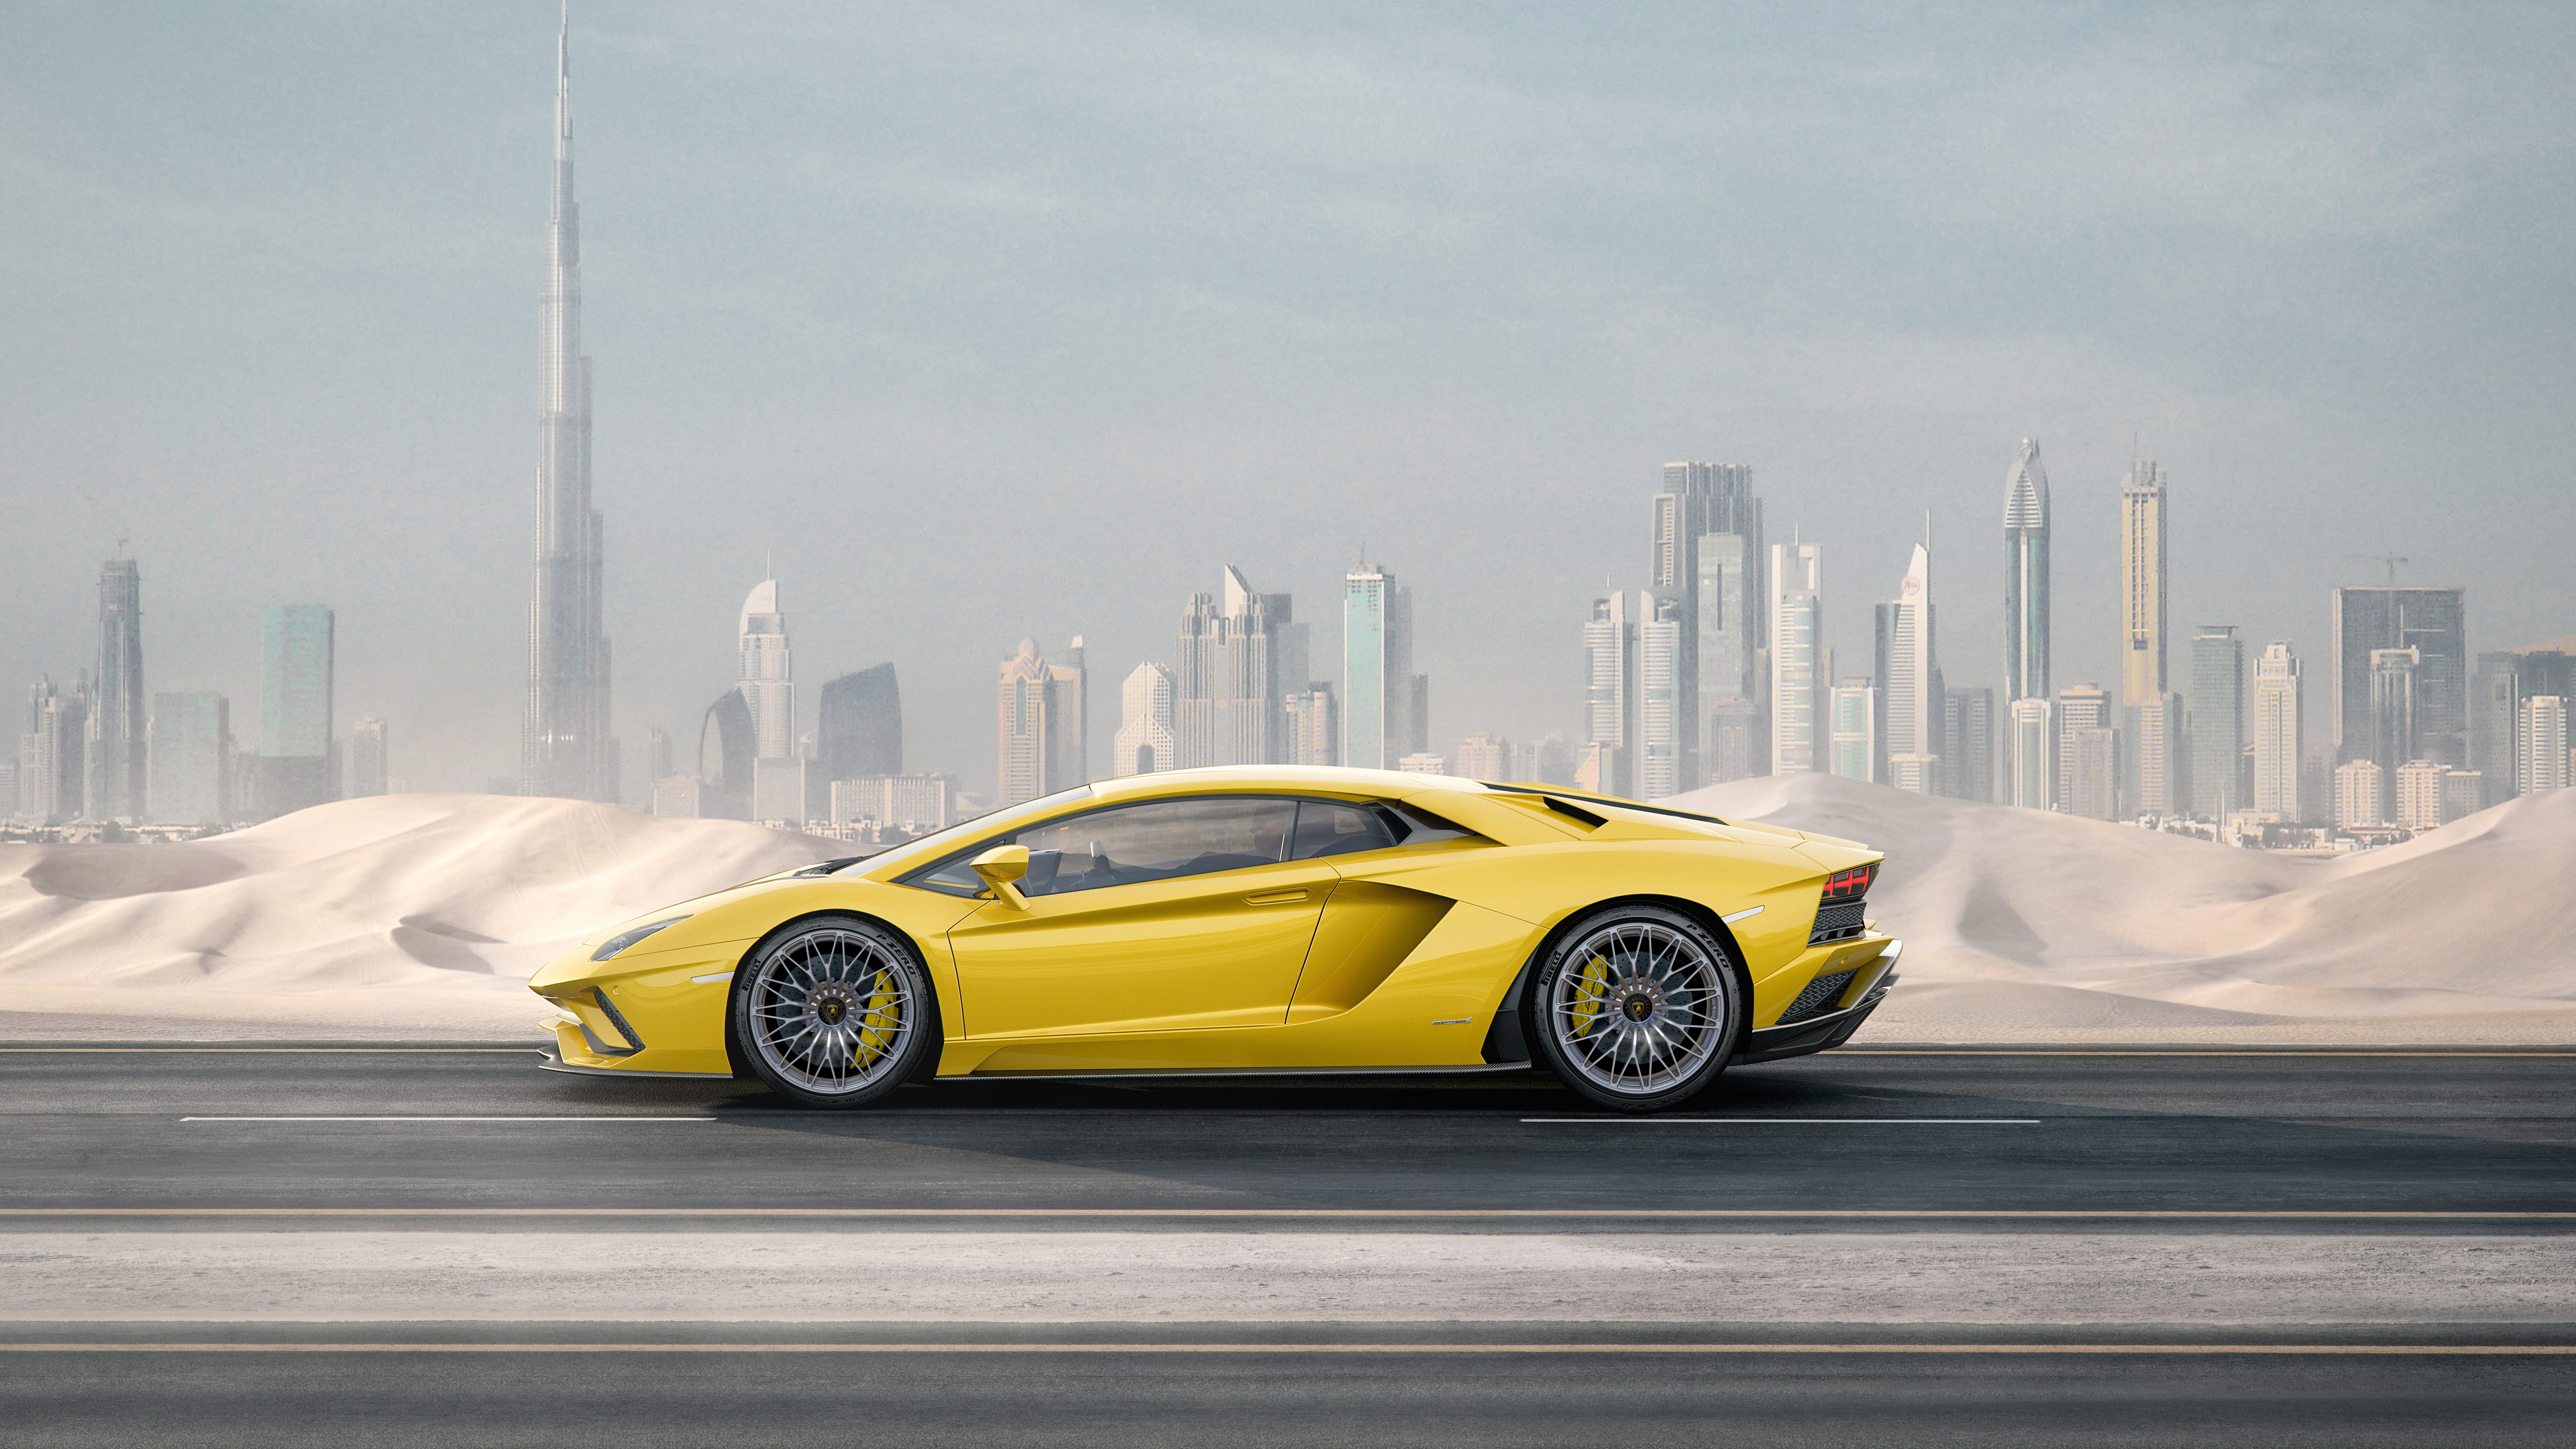 Lamborghini Gallardo LP IMSA GTV accident lawyers